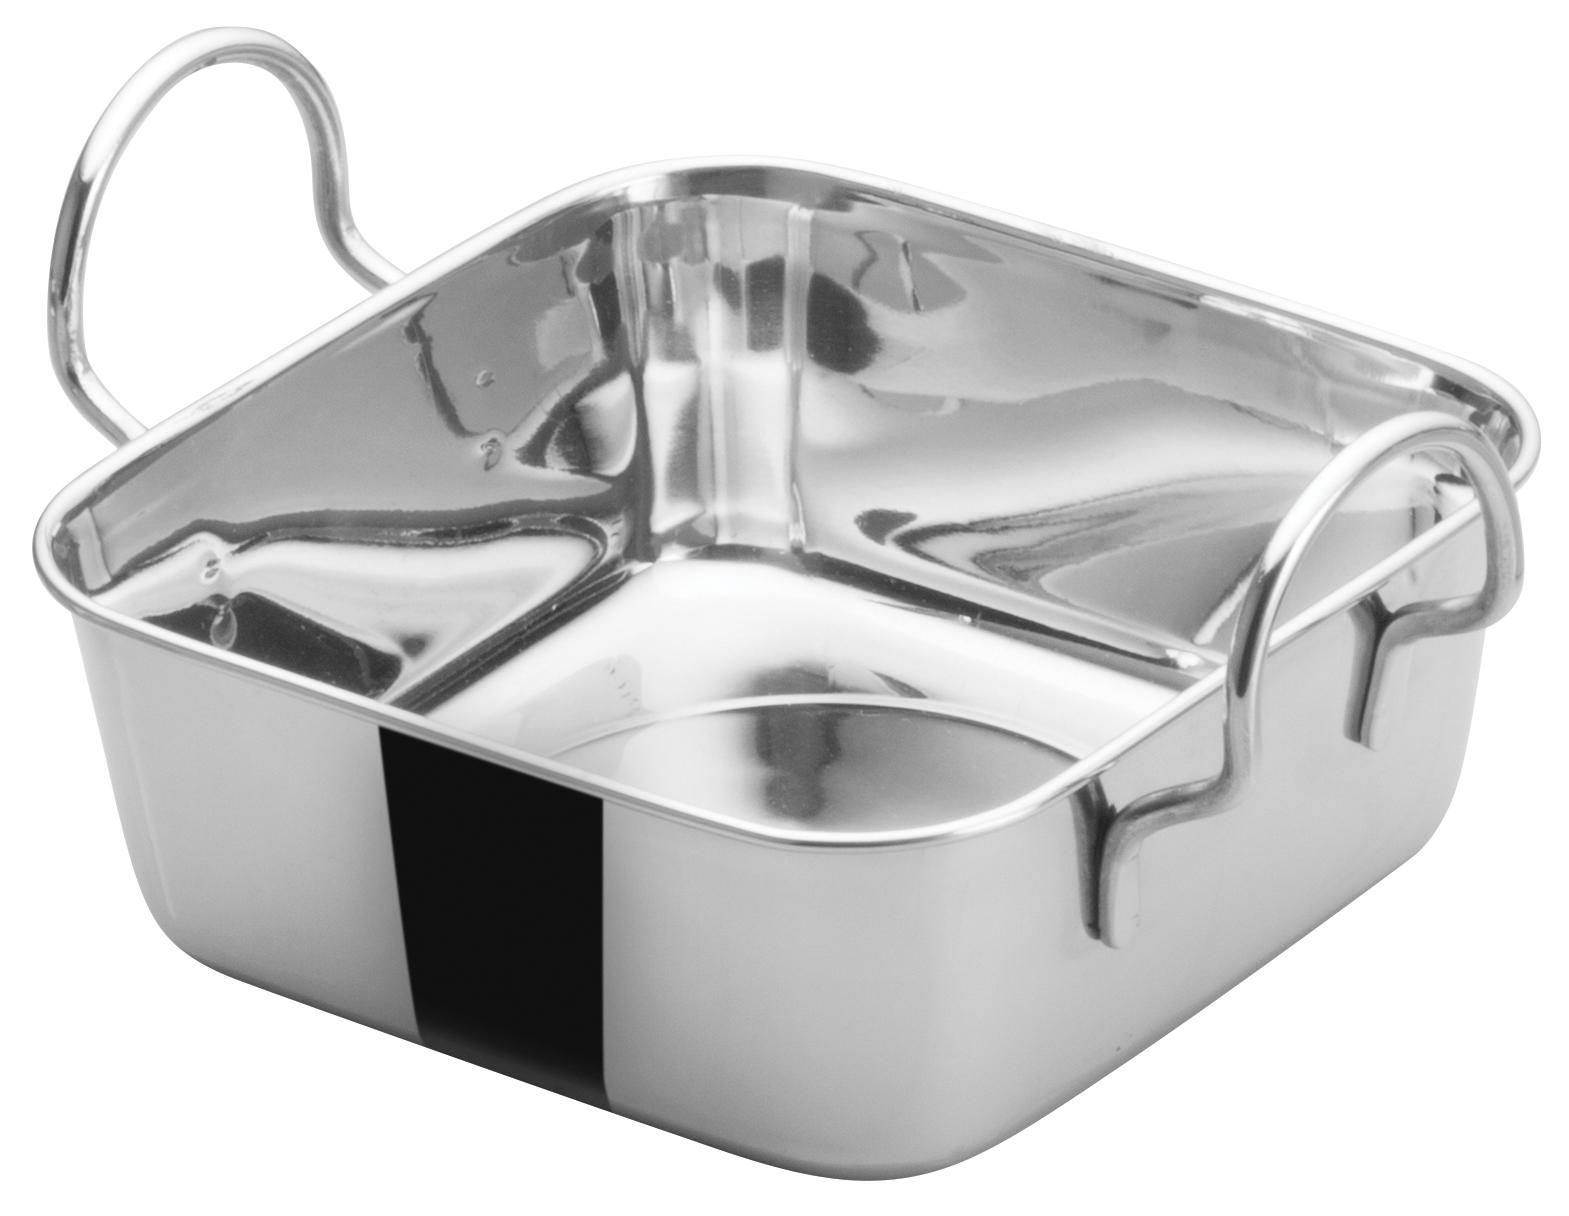 Winco DDSB-102S roasting pan